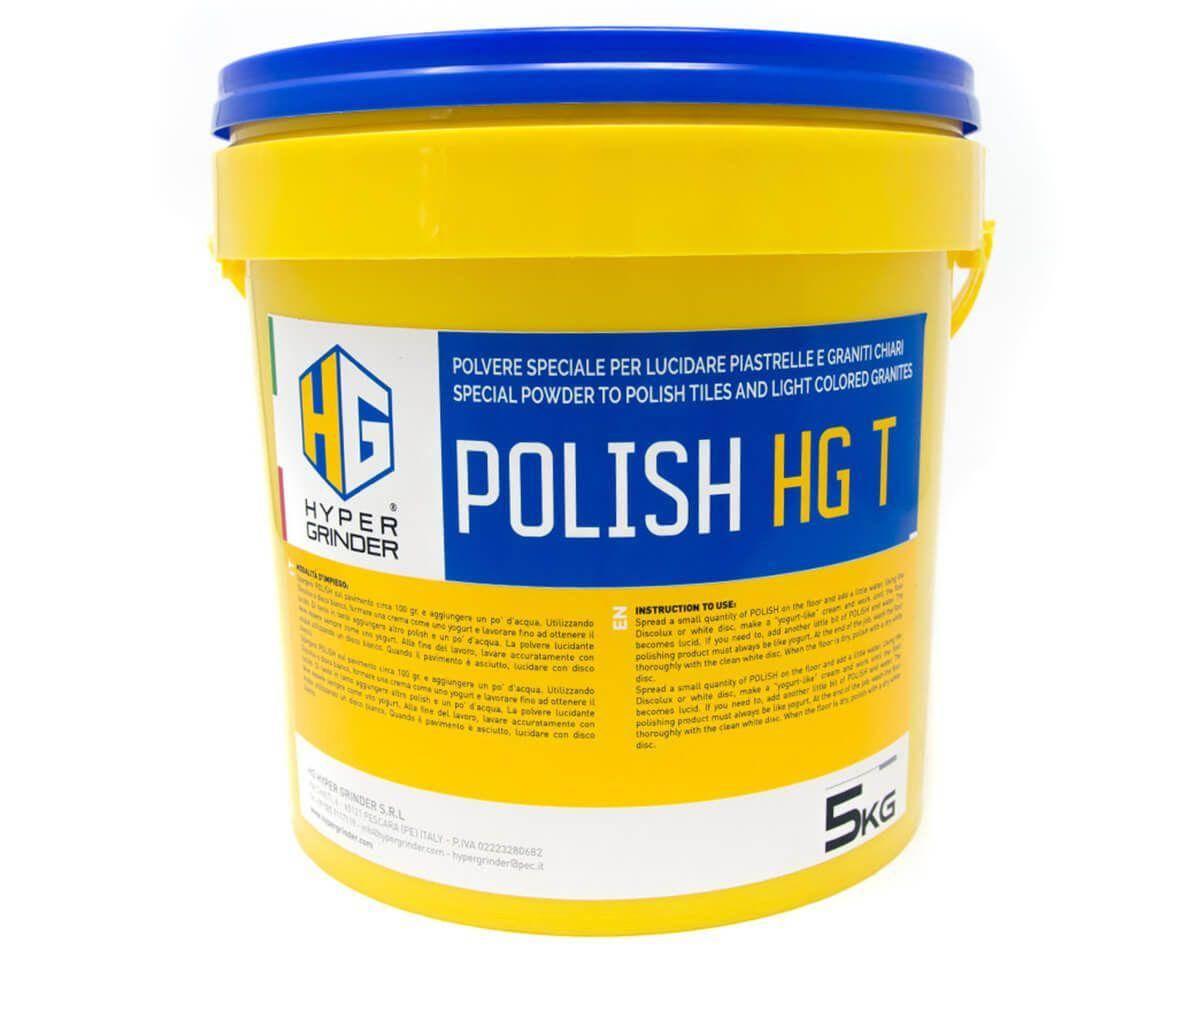 polishhgT 1240